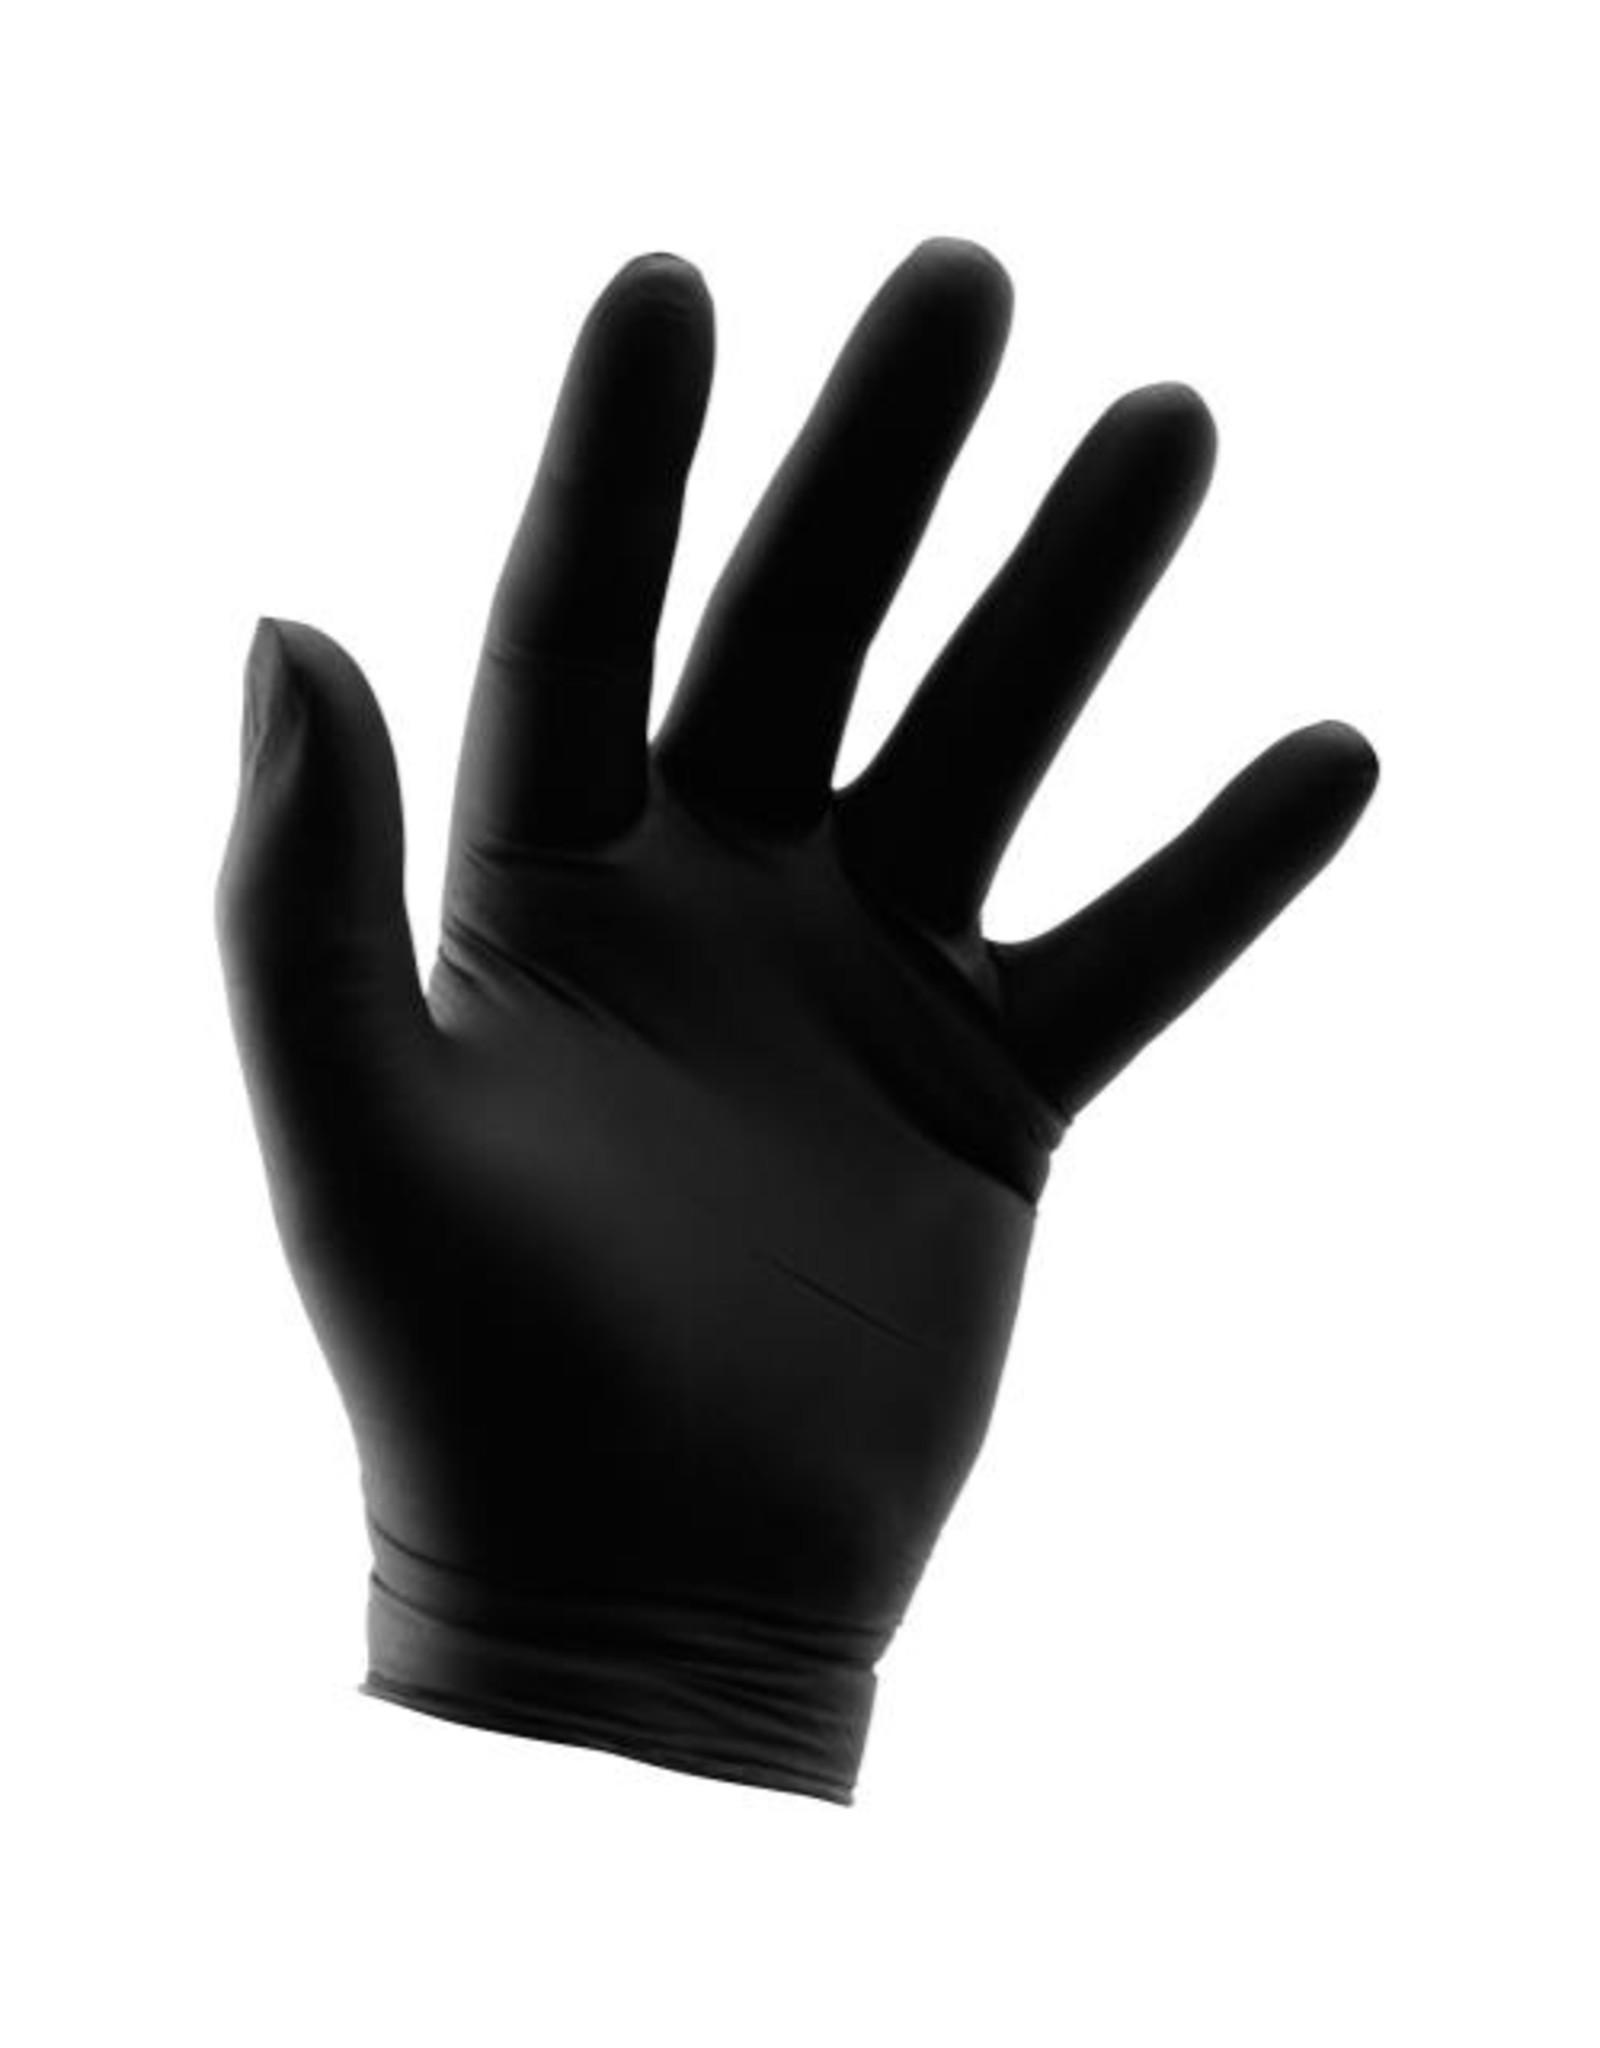 Grower's Edge Black Powder Free Nitrile Gloves 6 mil - Large